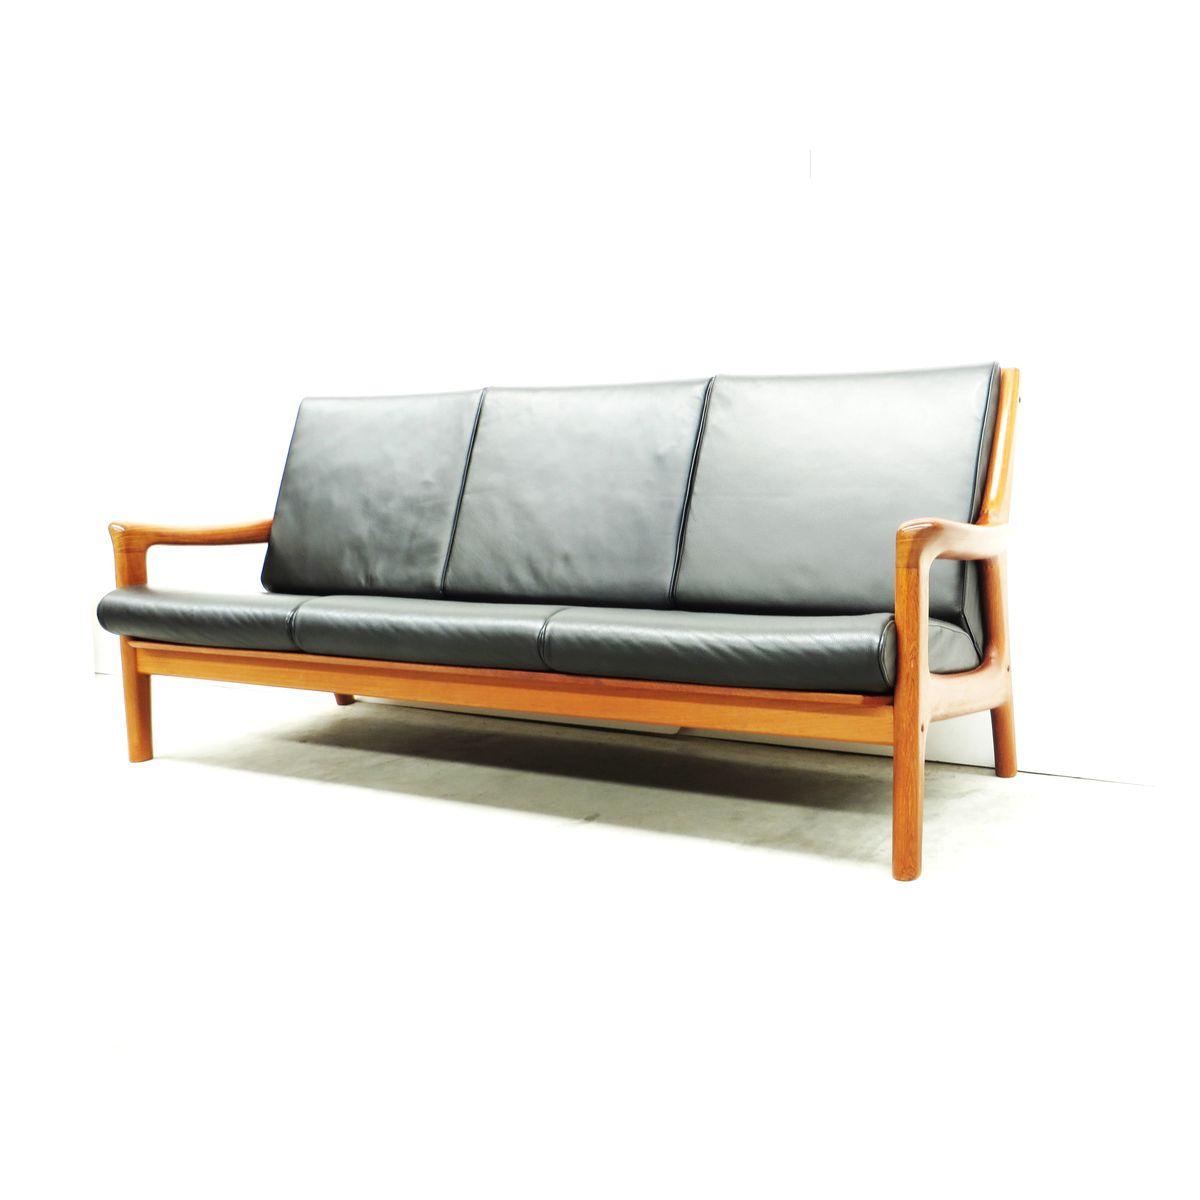 Danish Sofas A Mid Century Sofa By Jydsk Mobelvaerk